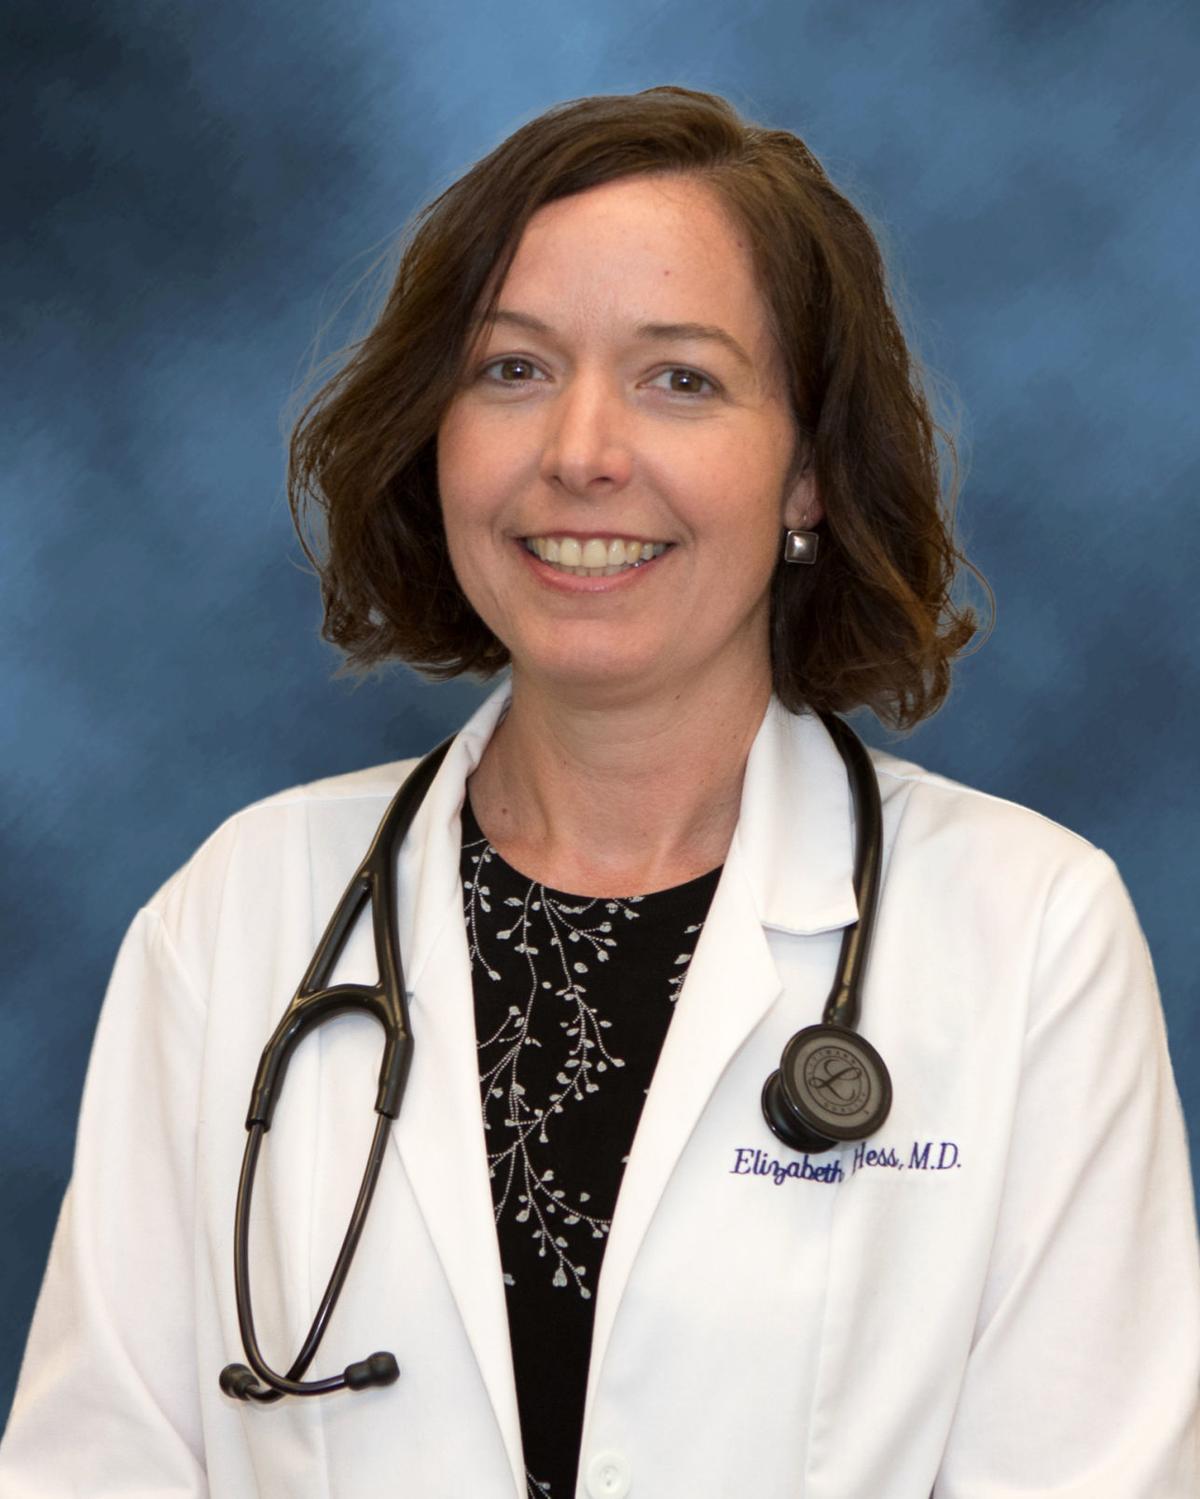 Dr. Elizabeth Hess.jpg